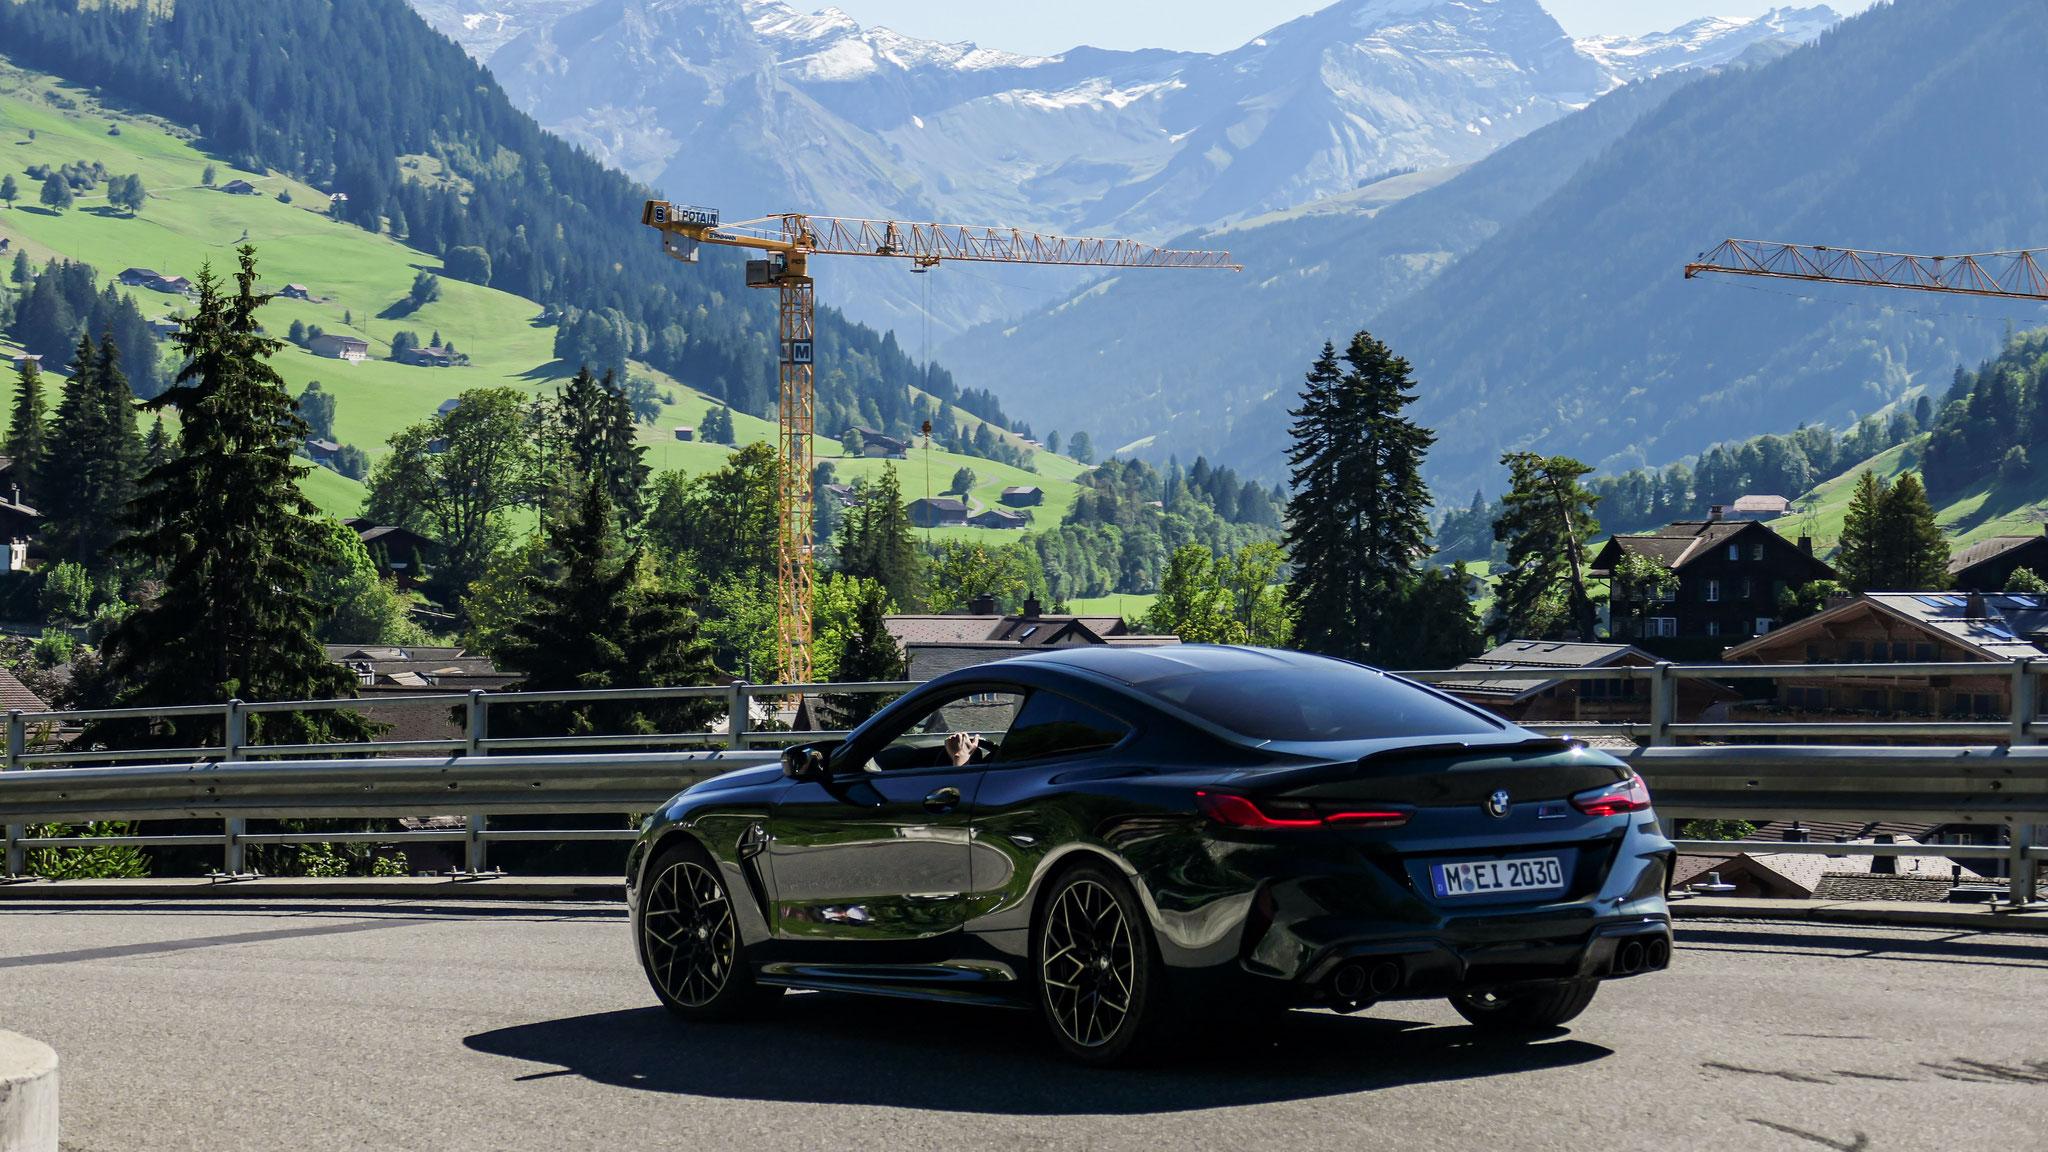 BMW M8 Competition - M-EI-2030